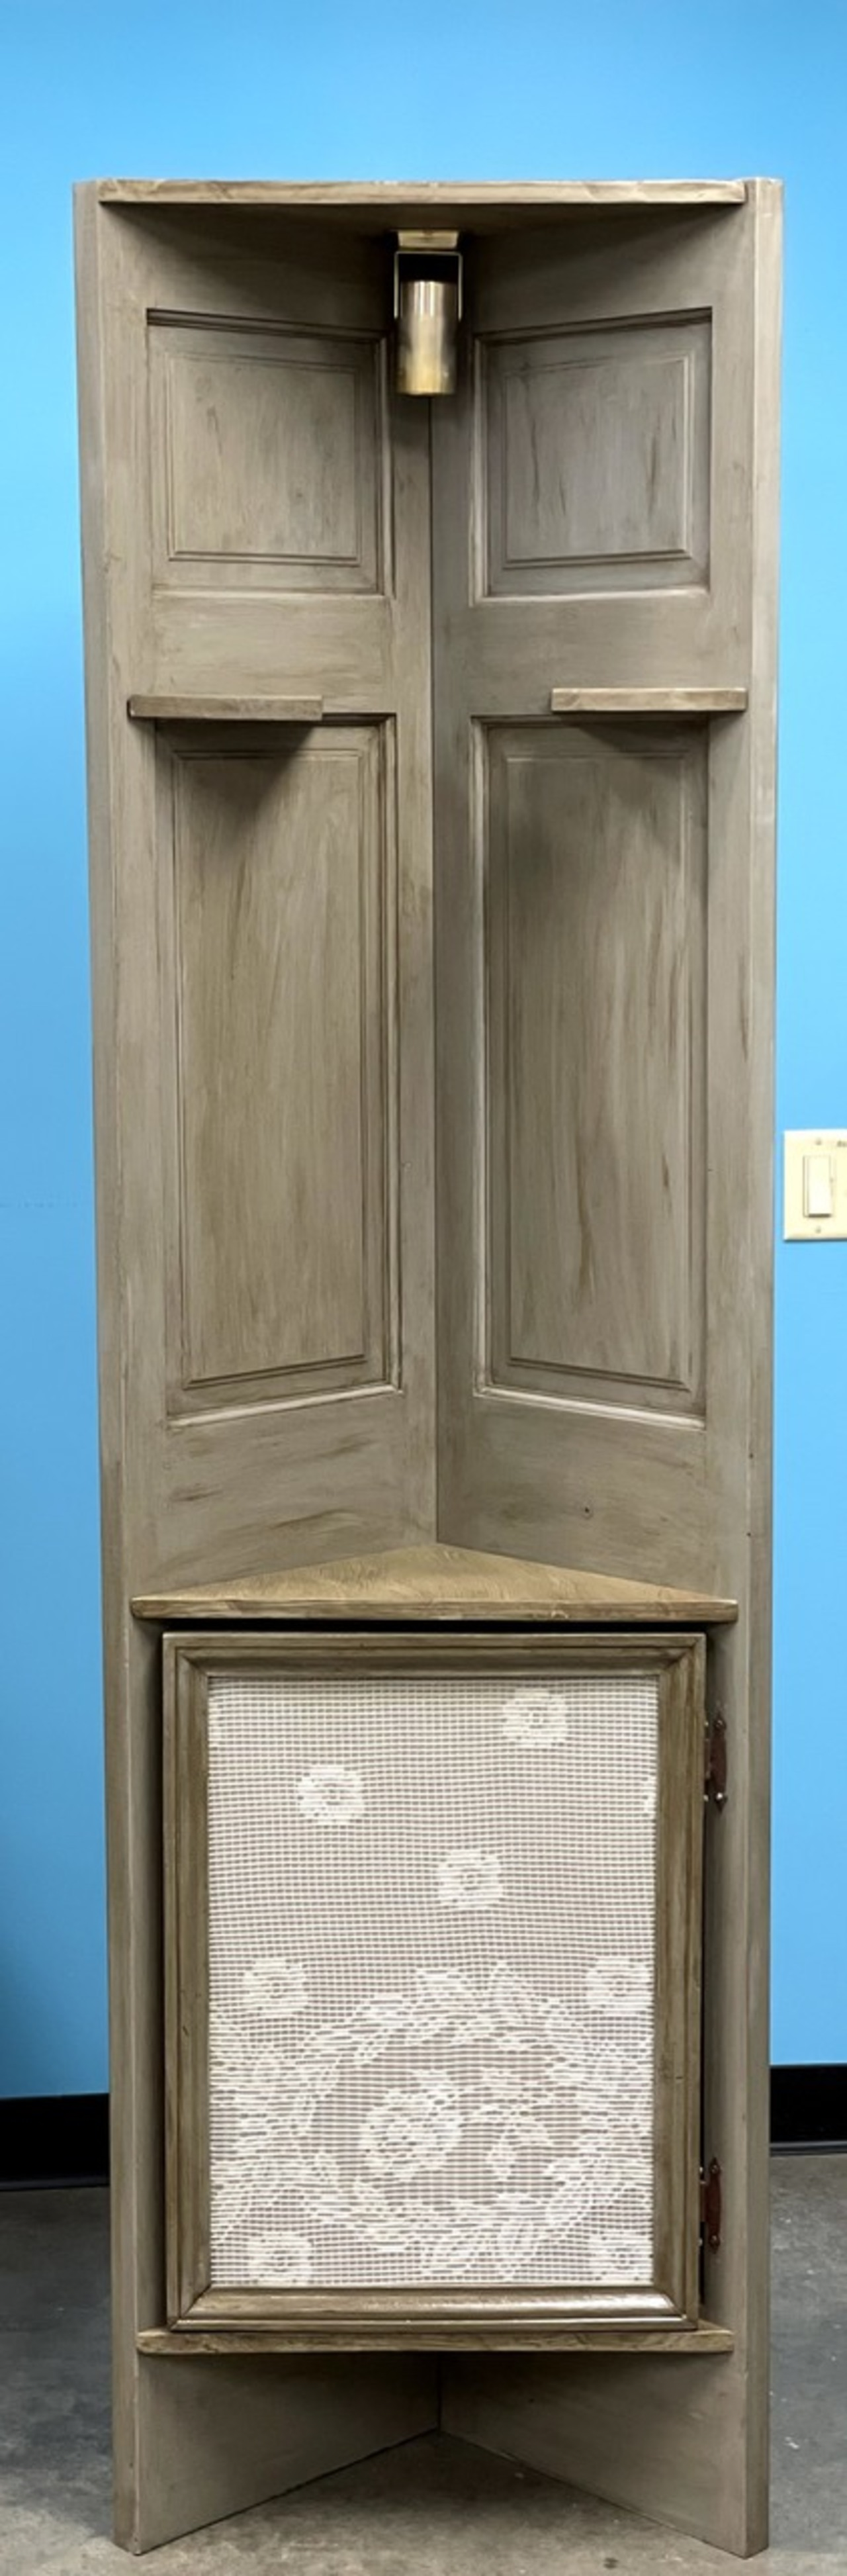 Item A - Corner Cabinet Display